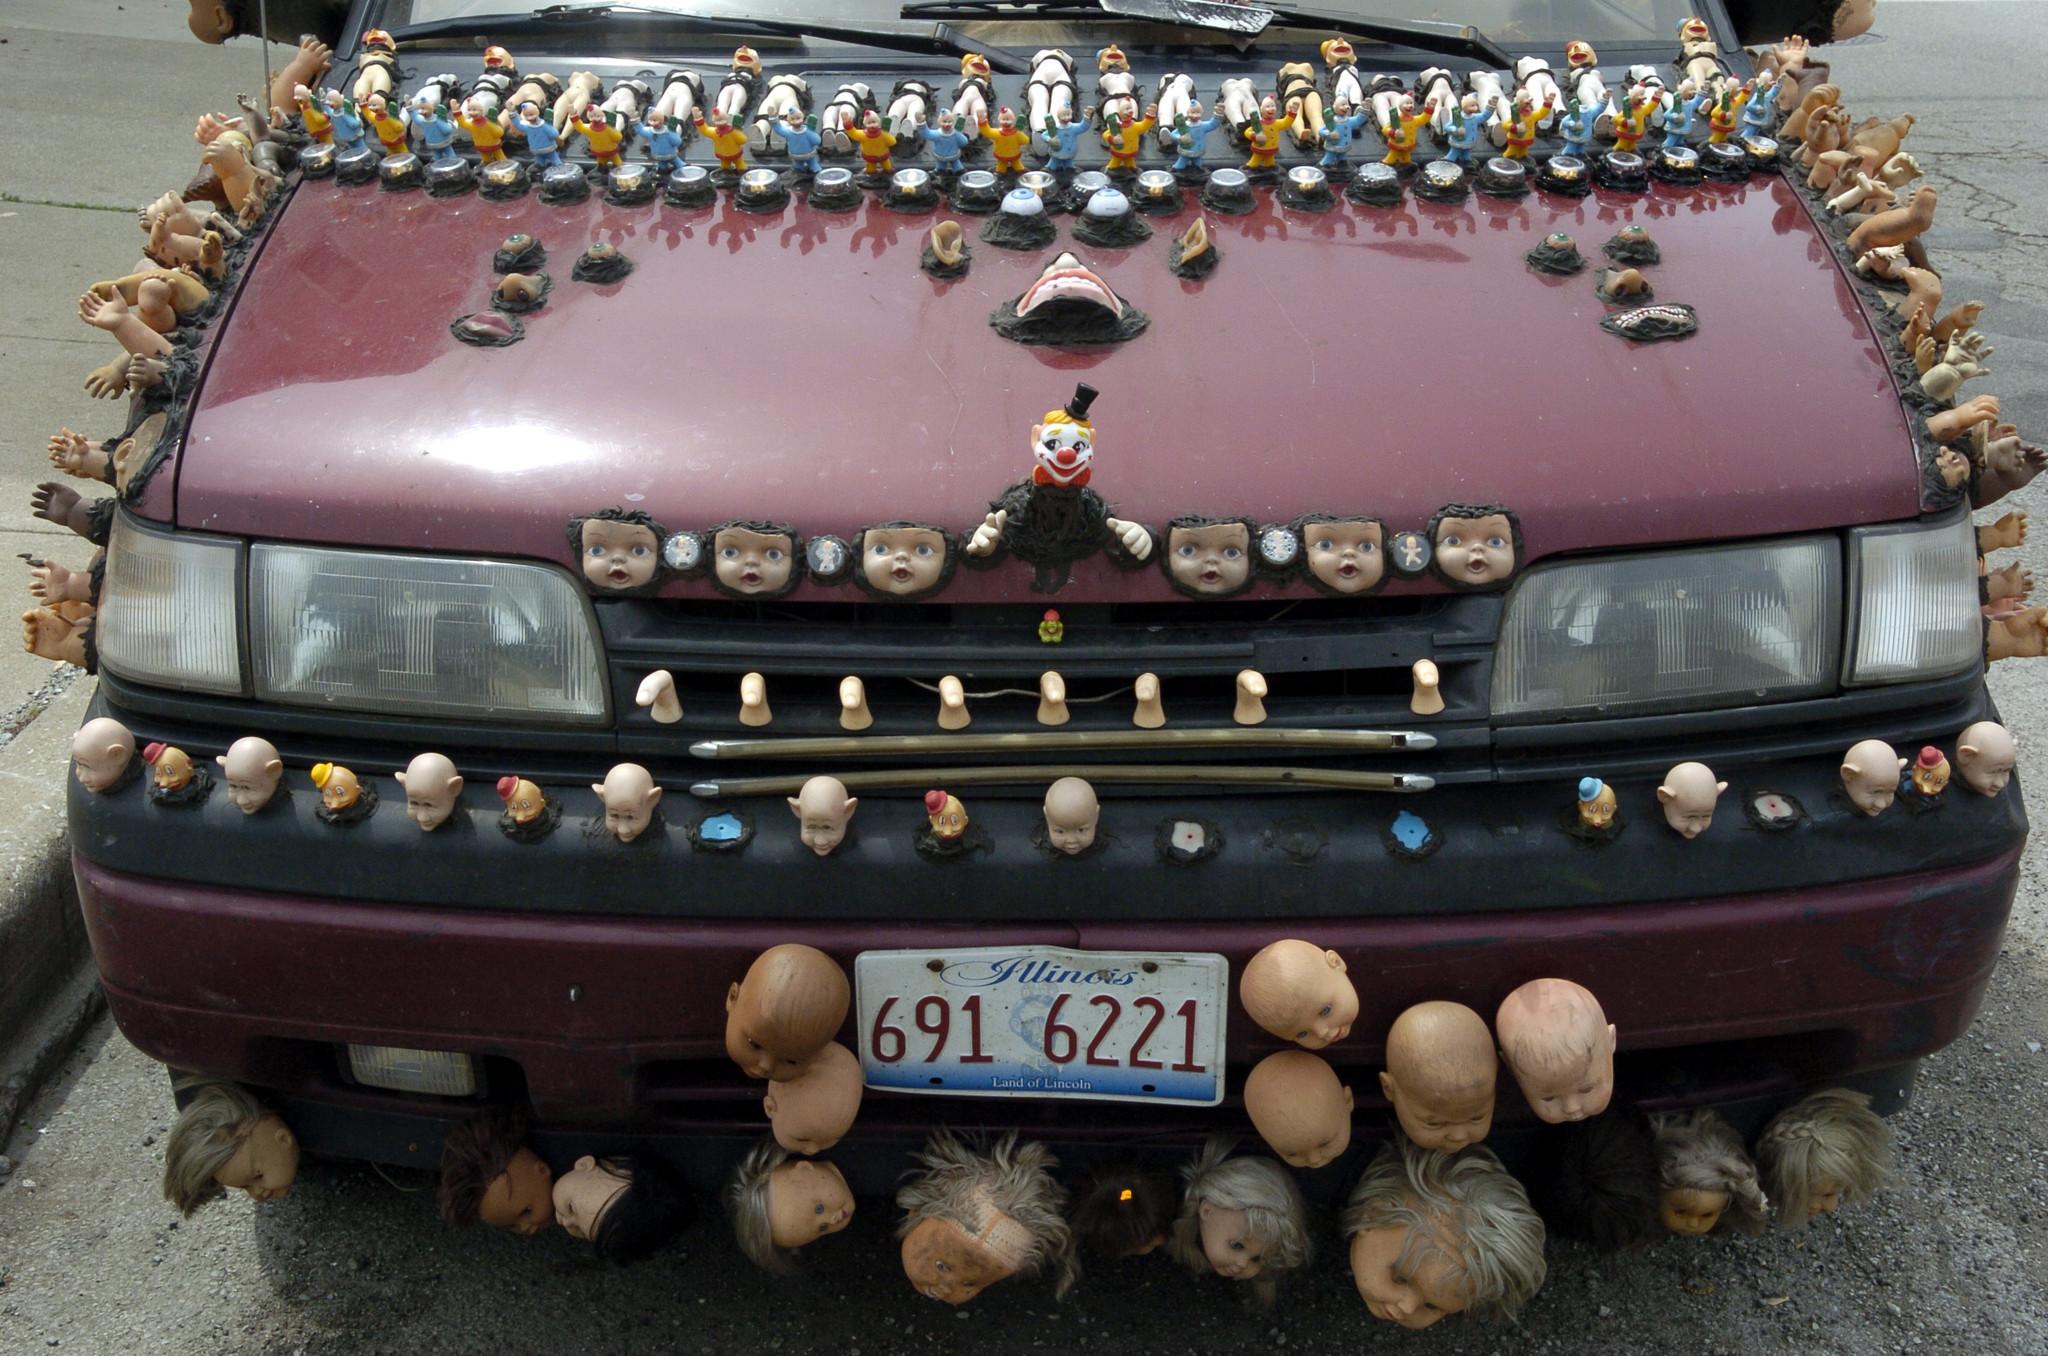 Costume cars for Halloween - Chicago Tribune